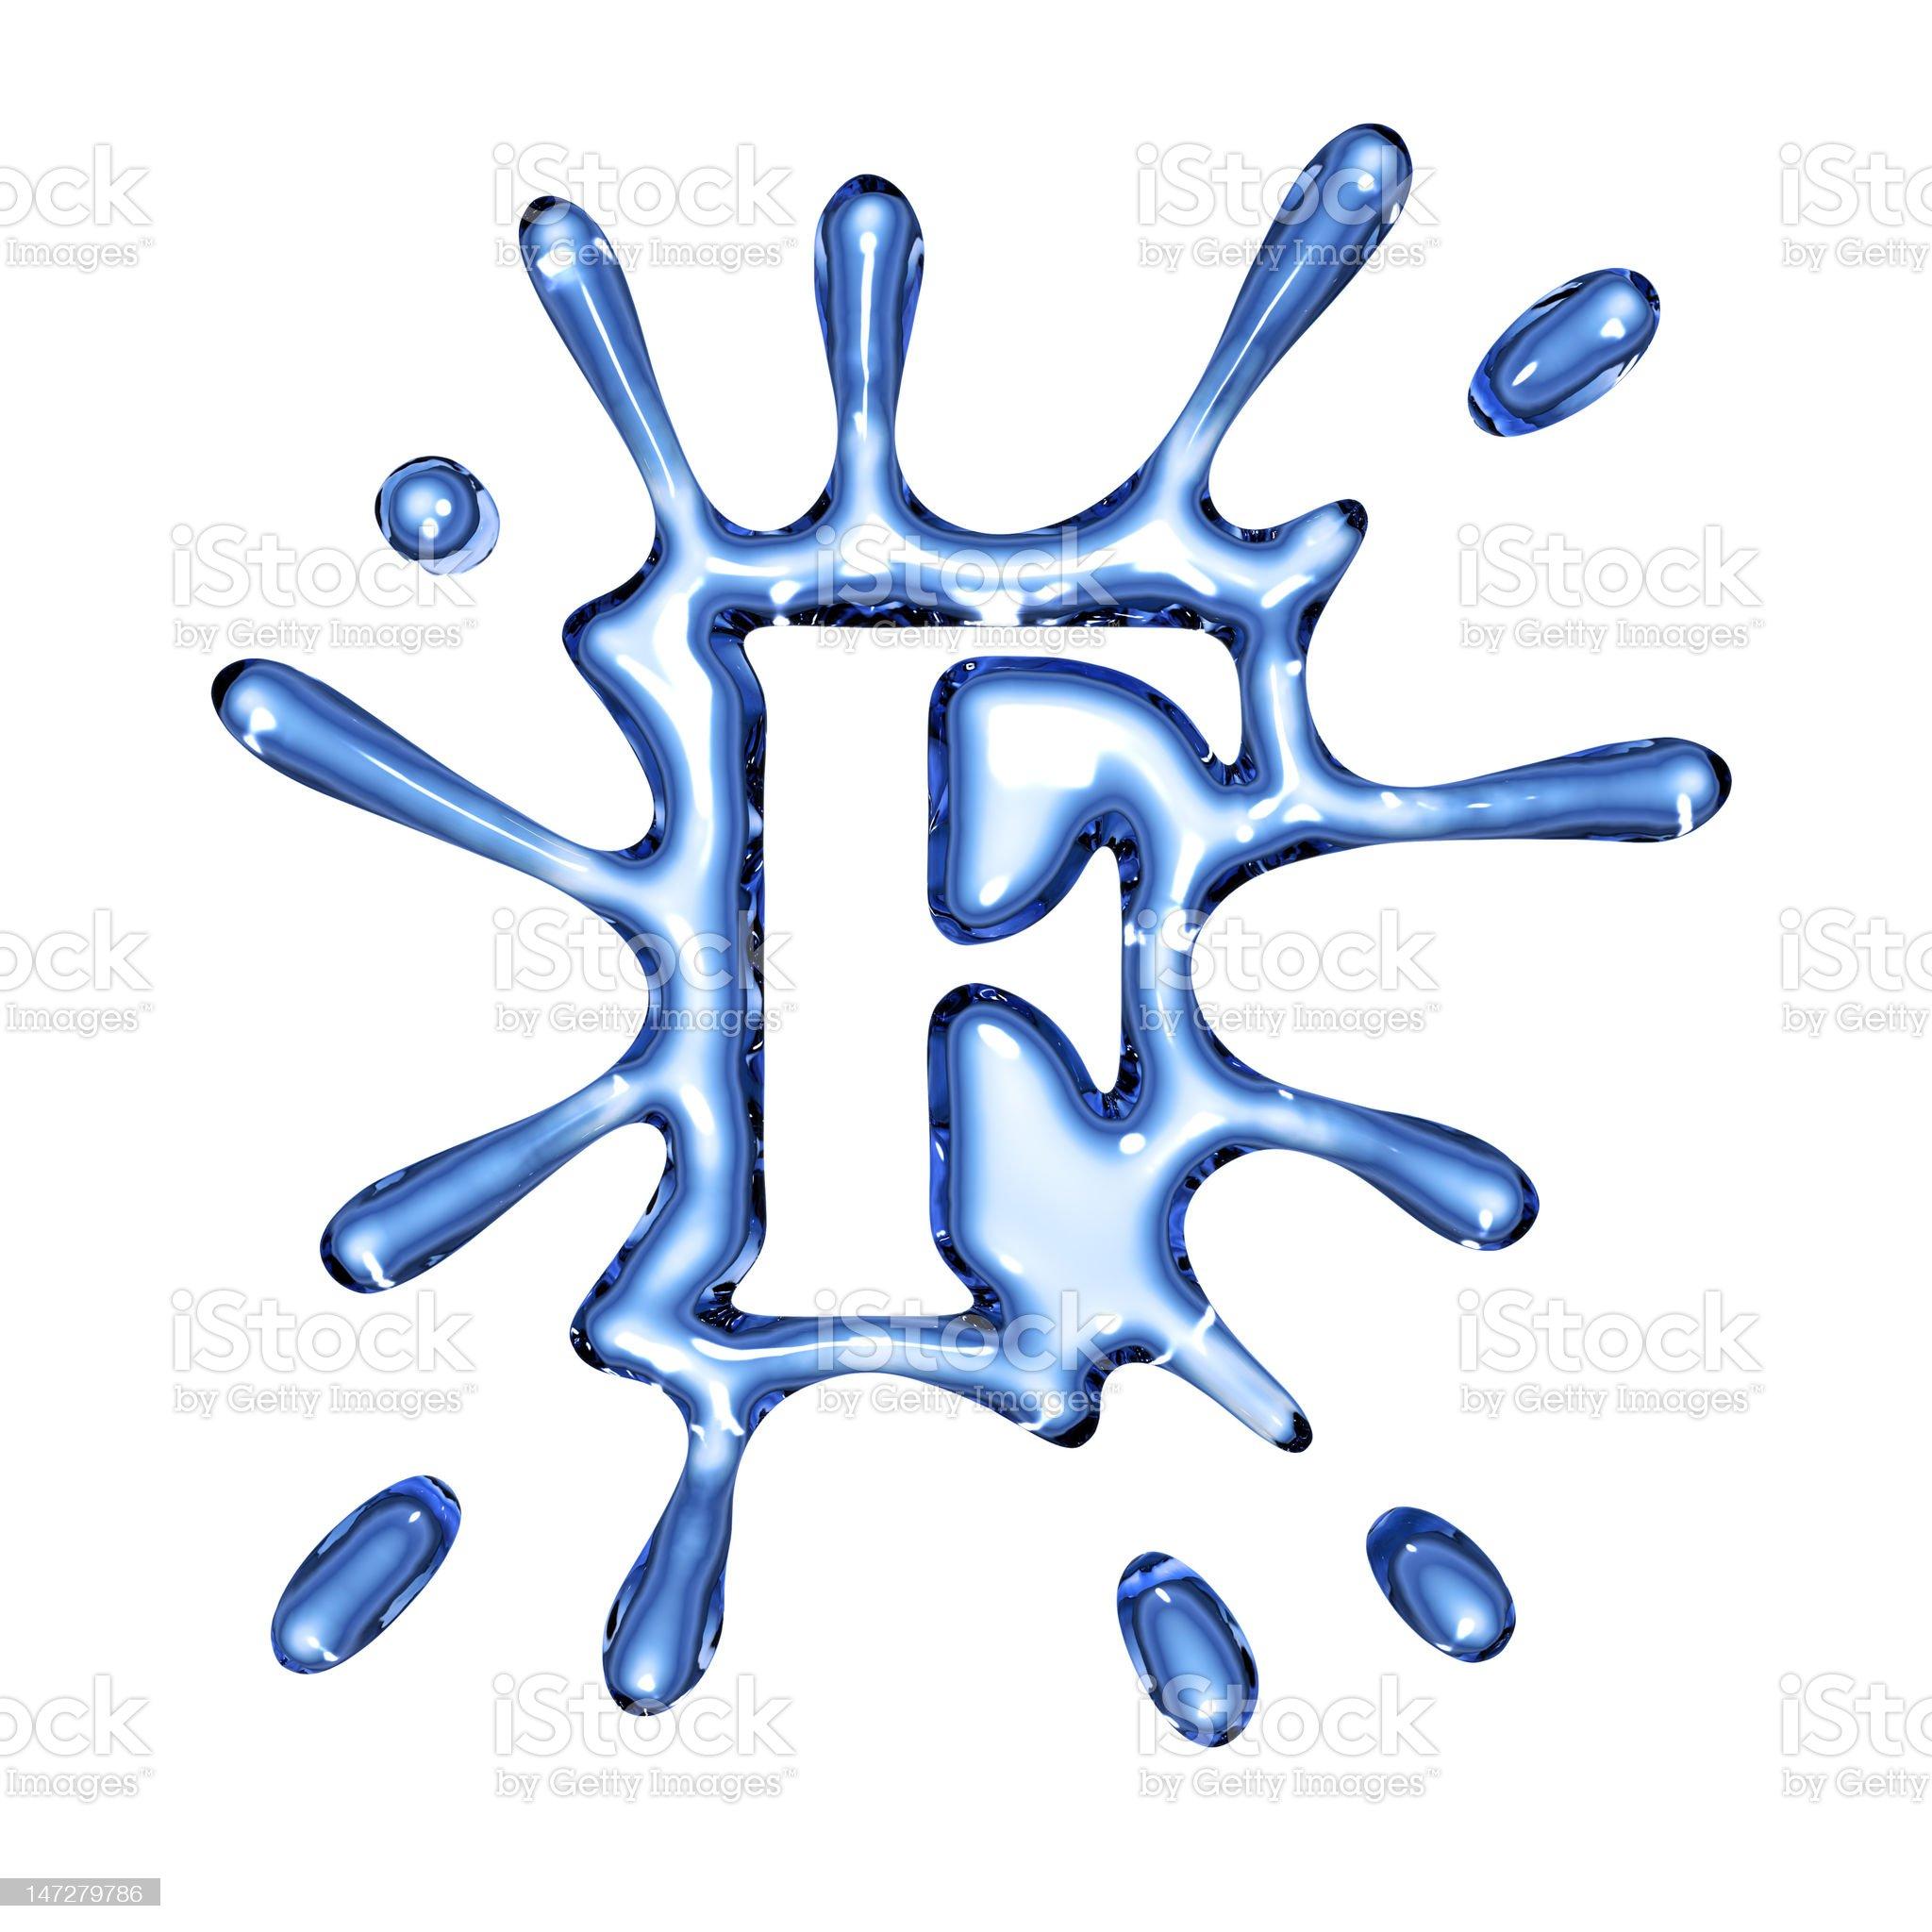 Blue splash water letter F royalty-free stock photo